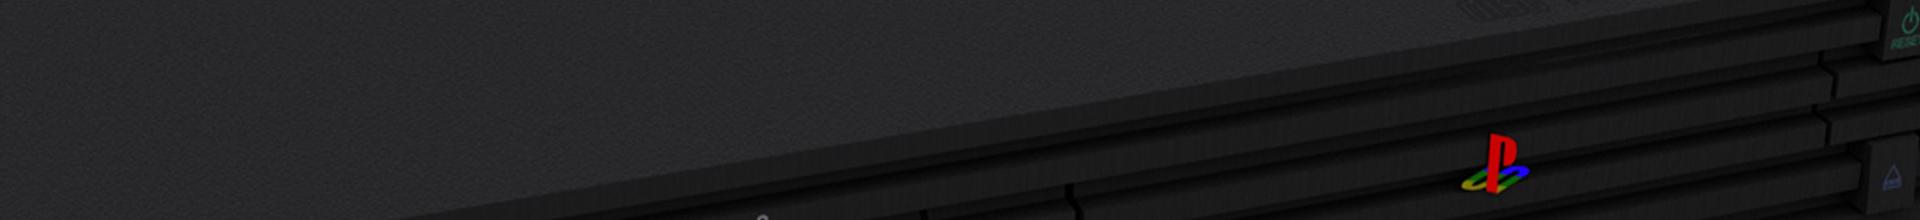 2001 - PlayStation 2